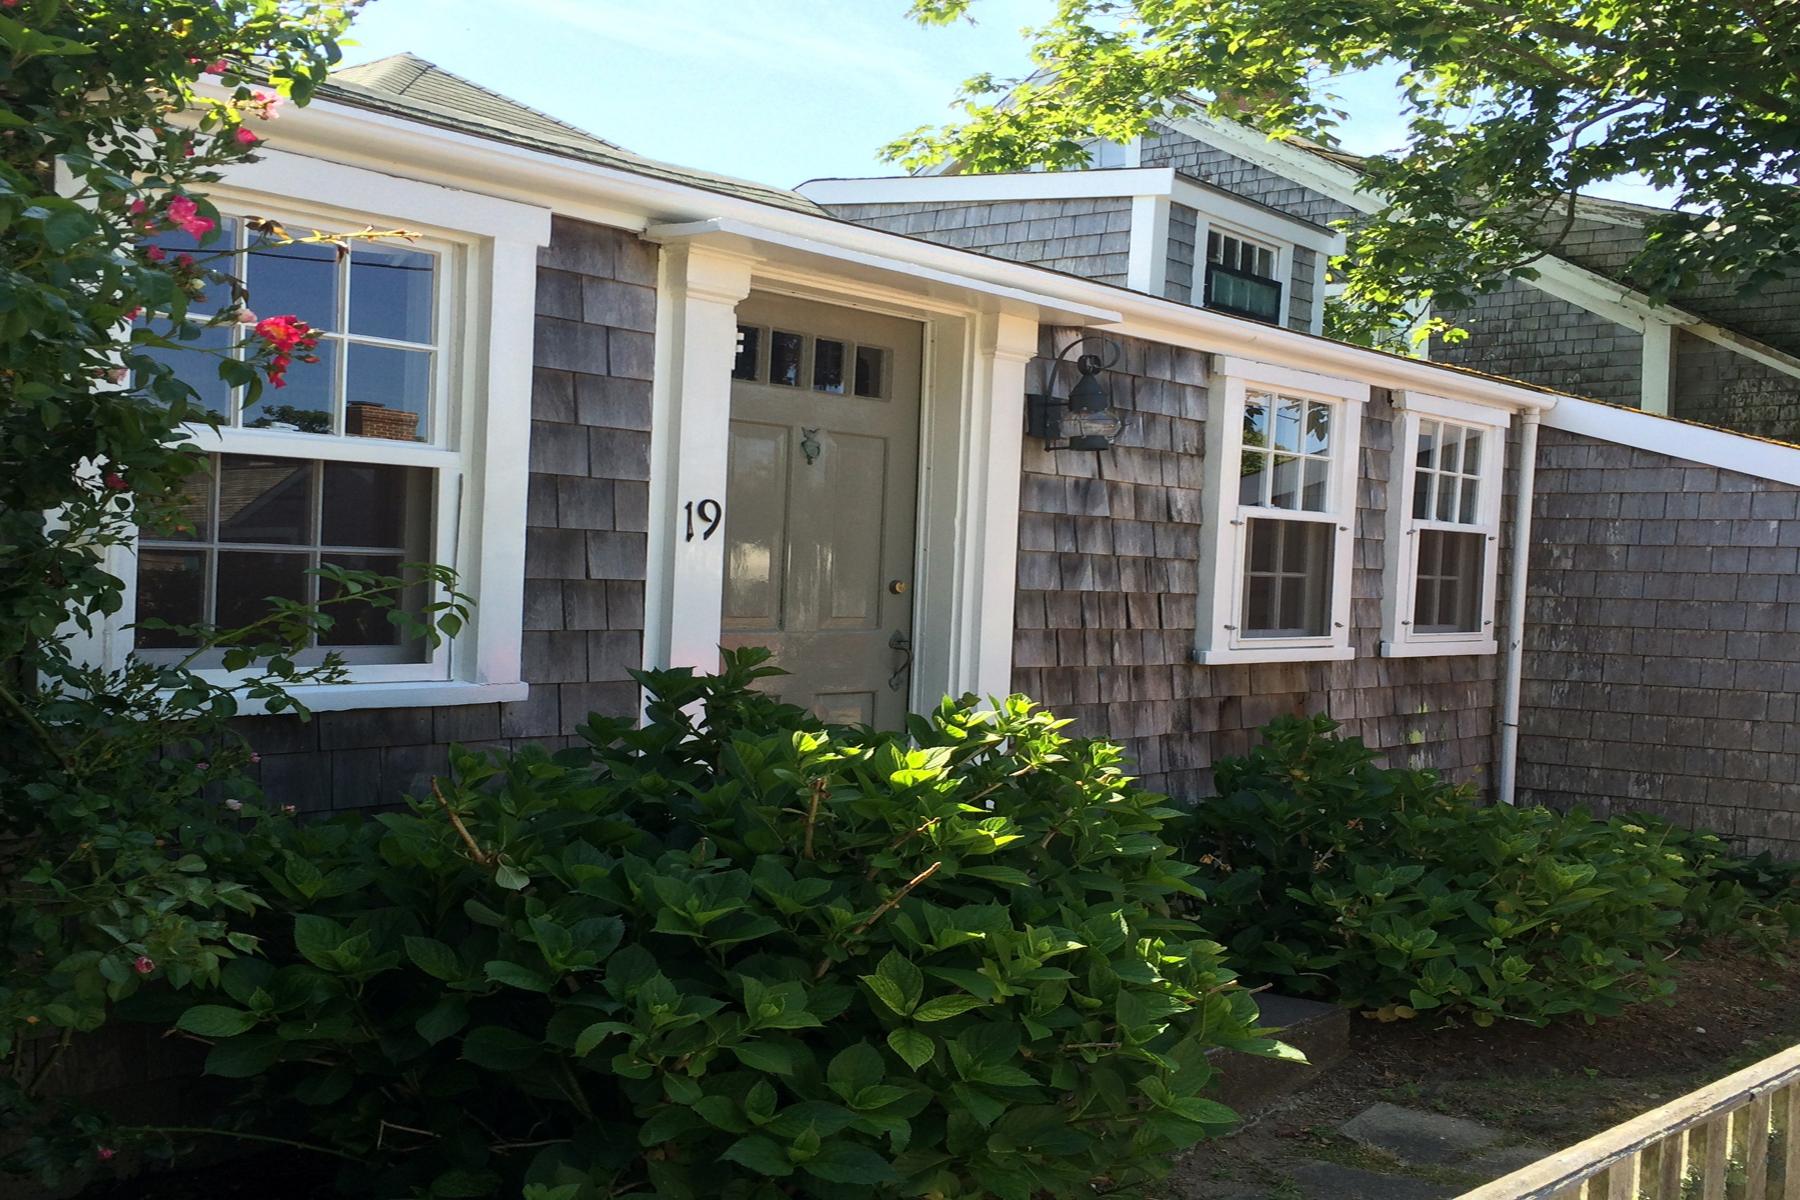 Moradia para Venda às Delightful Cottage with Water Views 19 Broadway Siasconset, Massachusetts, 02554 Estados Unidos